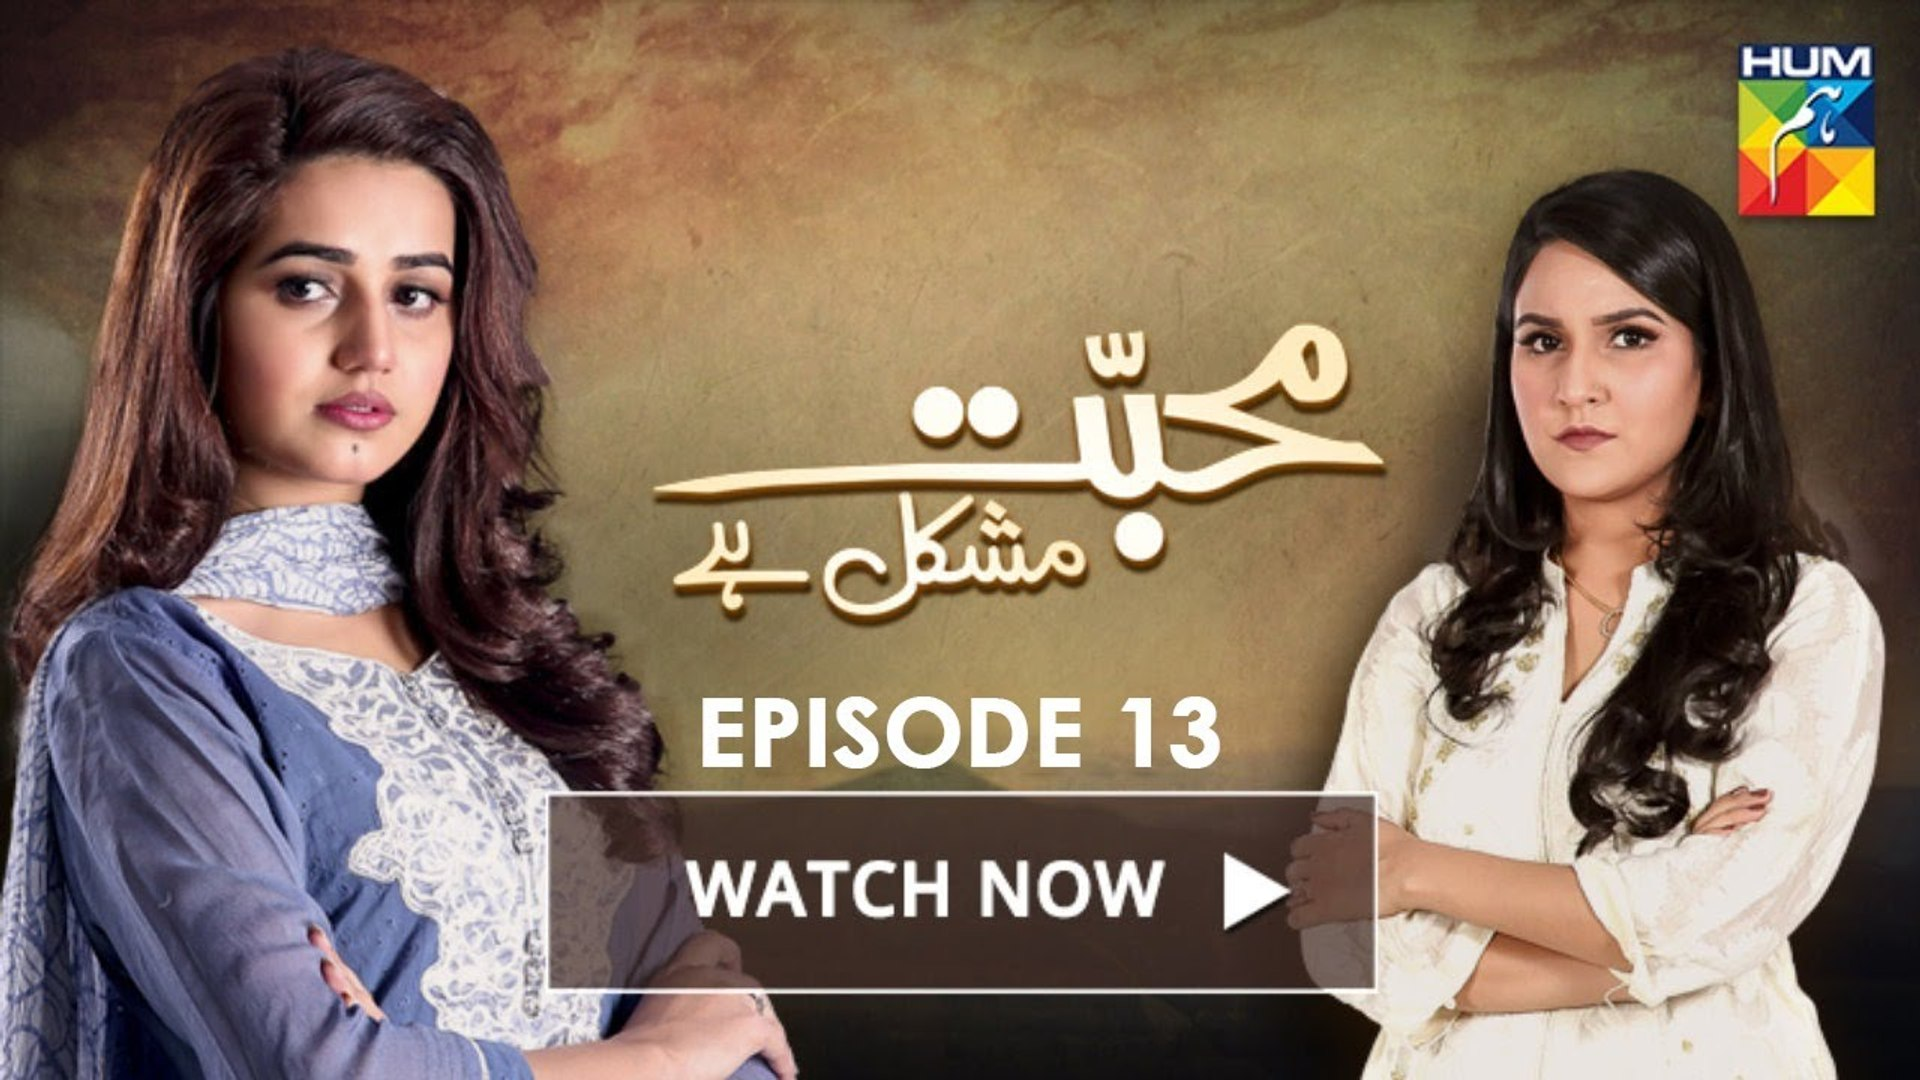 Mohabbat Mushkil Hai Episode 13 HUM TV